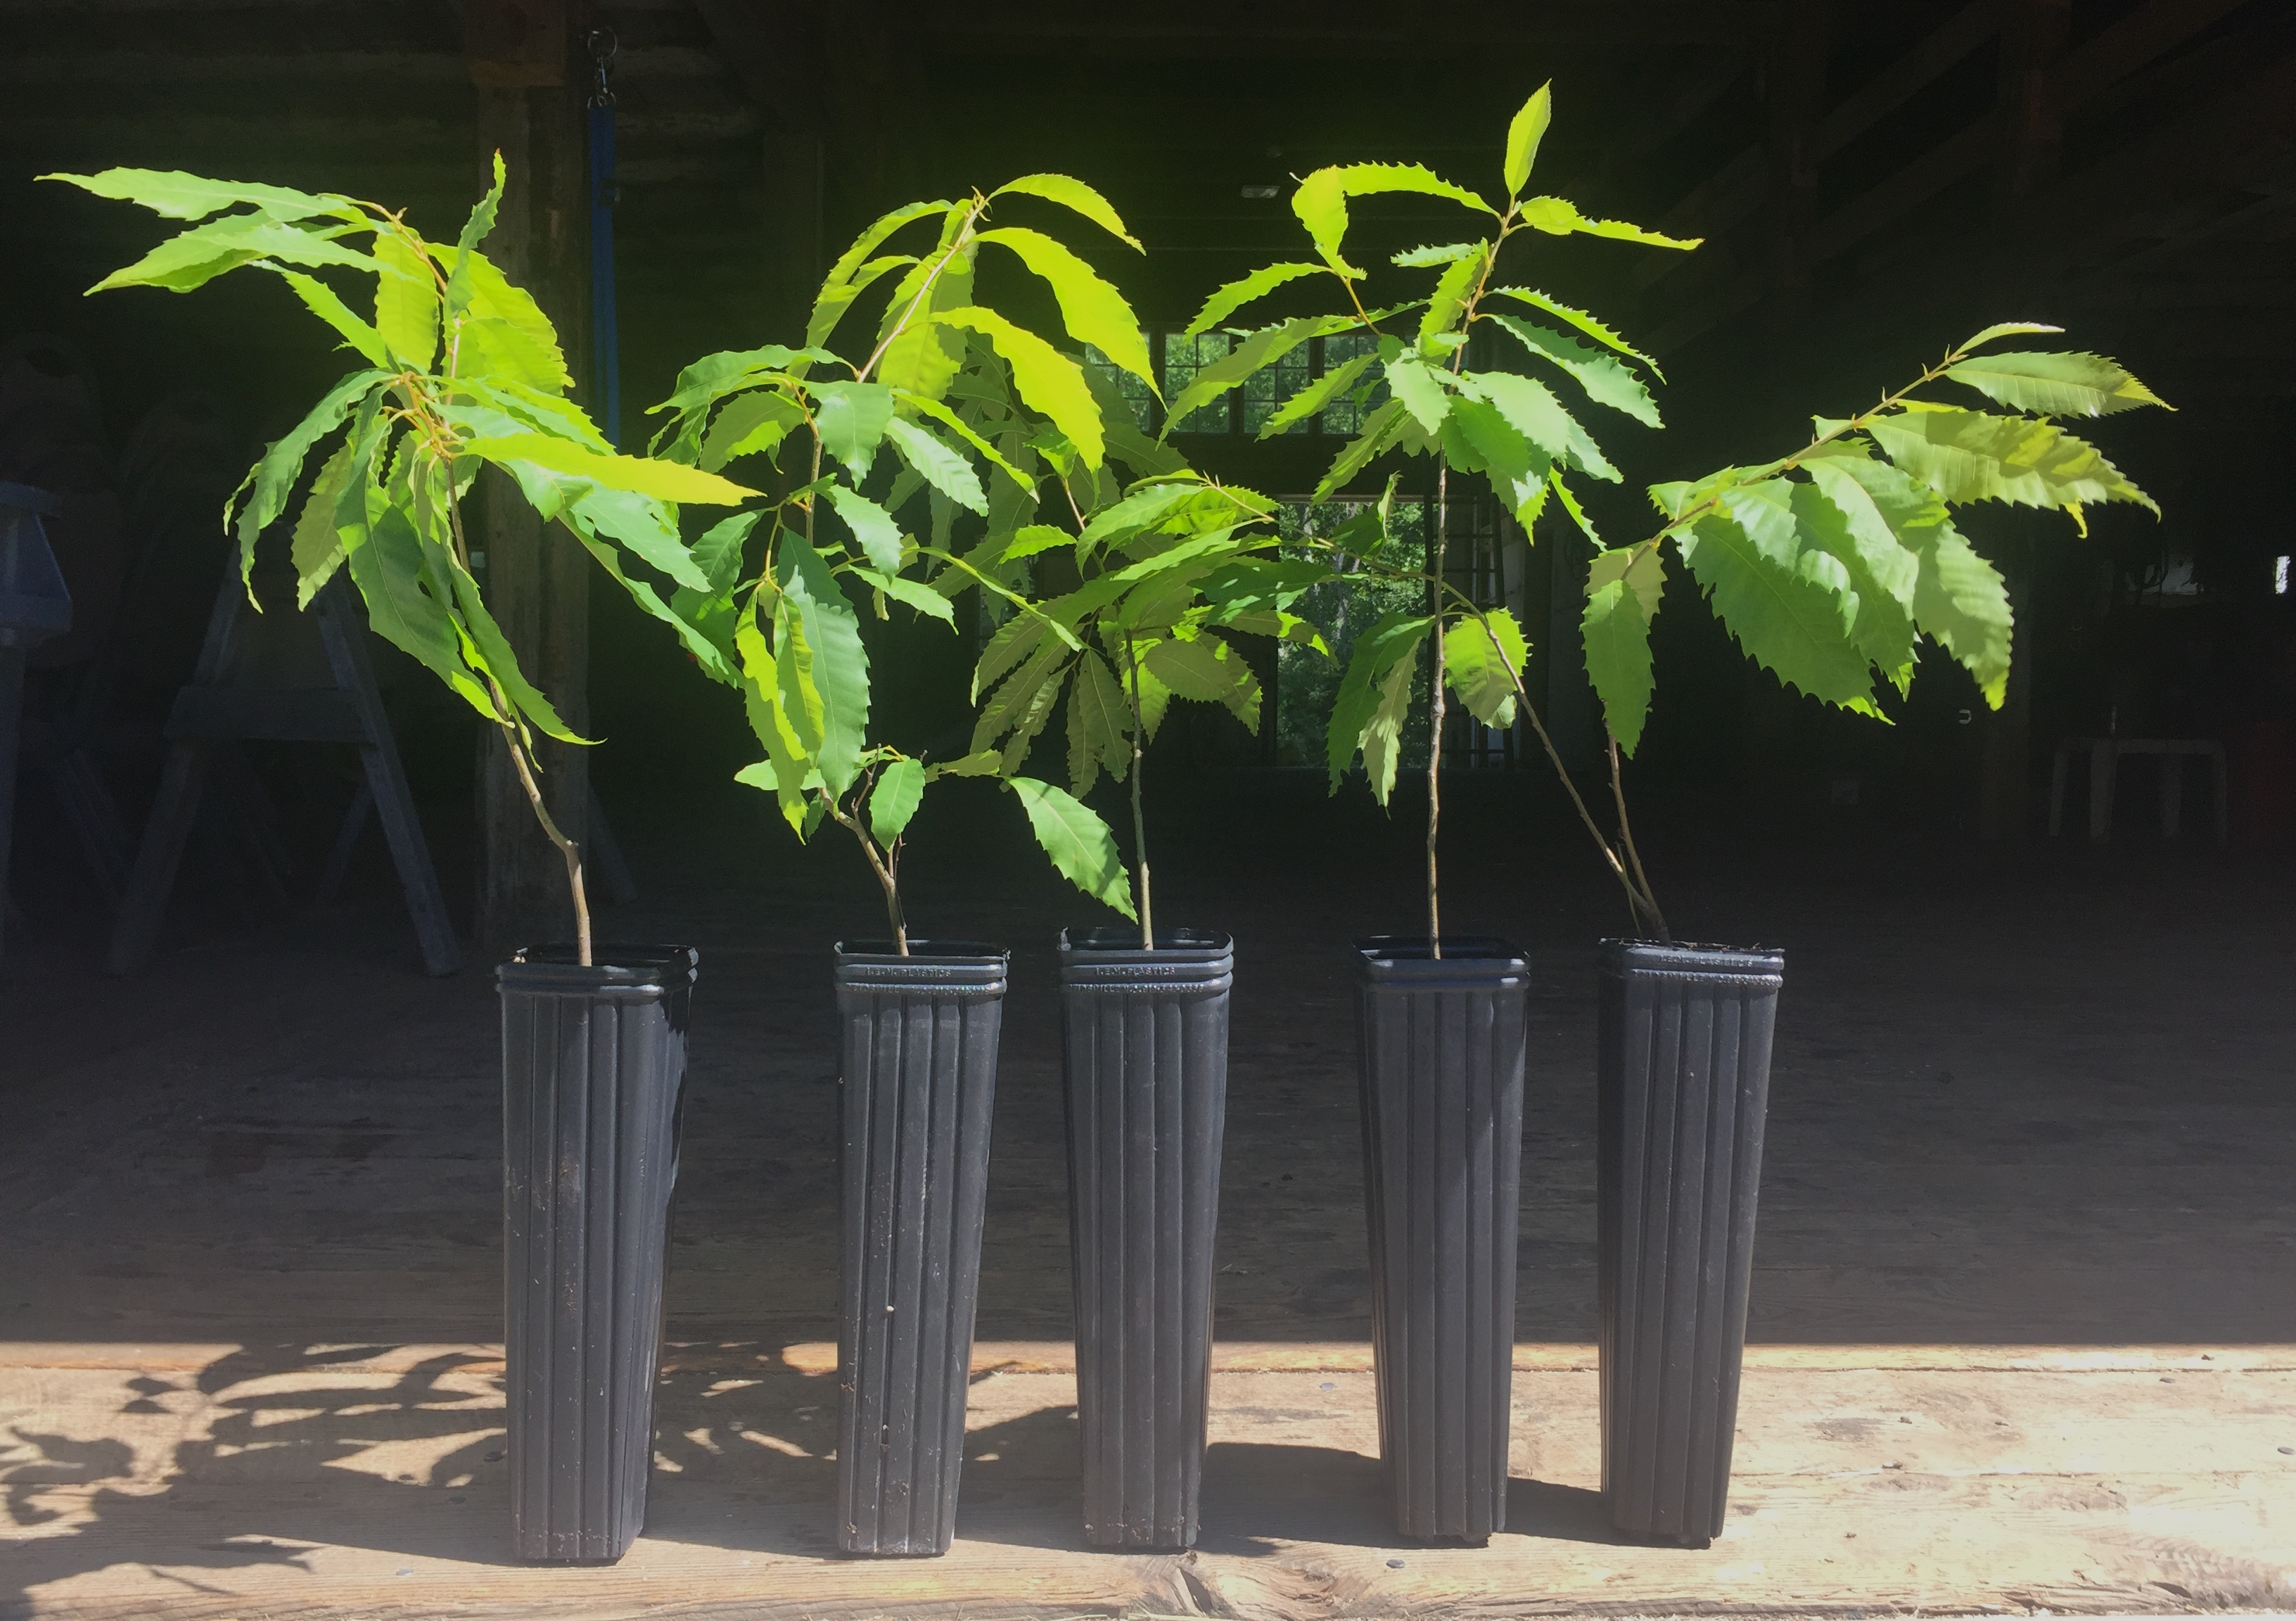 American Chestnut Seedlings